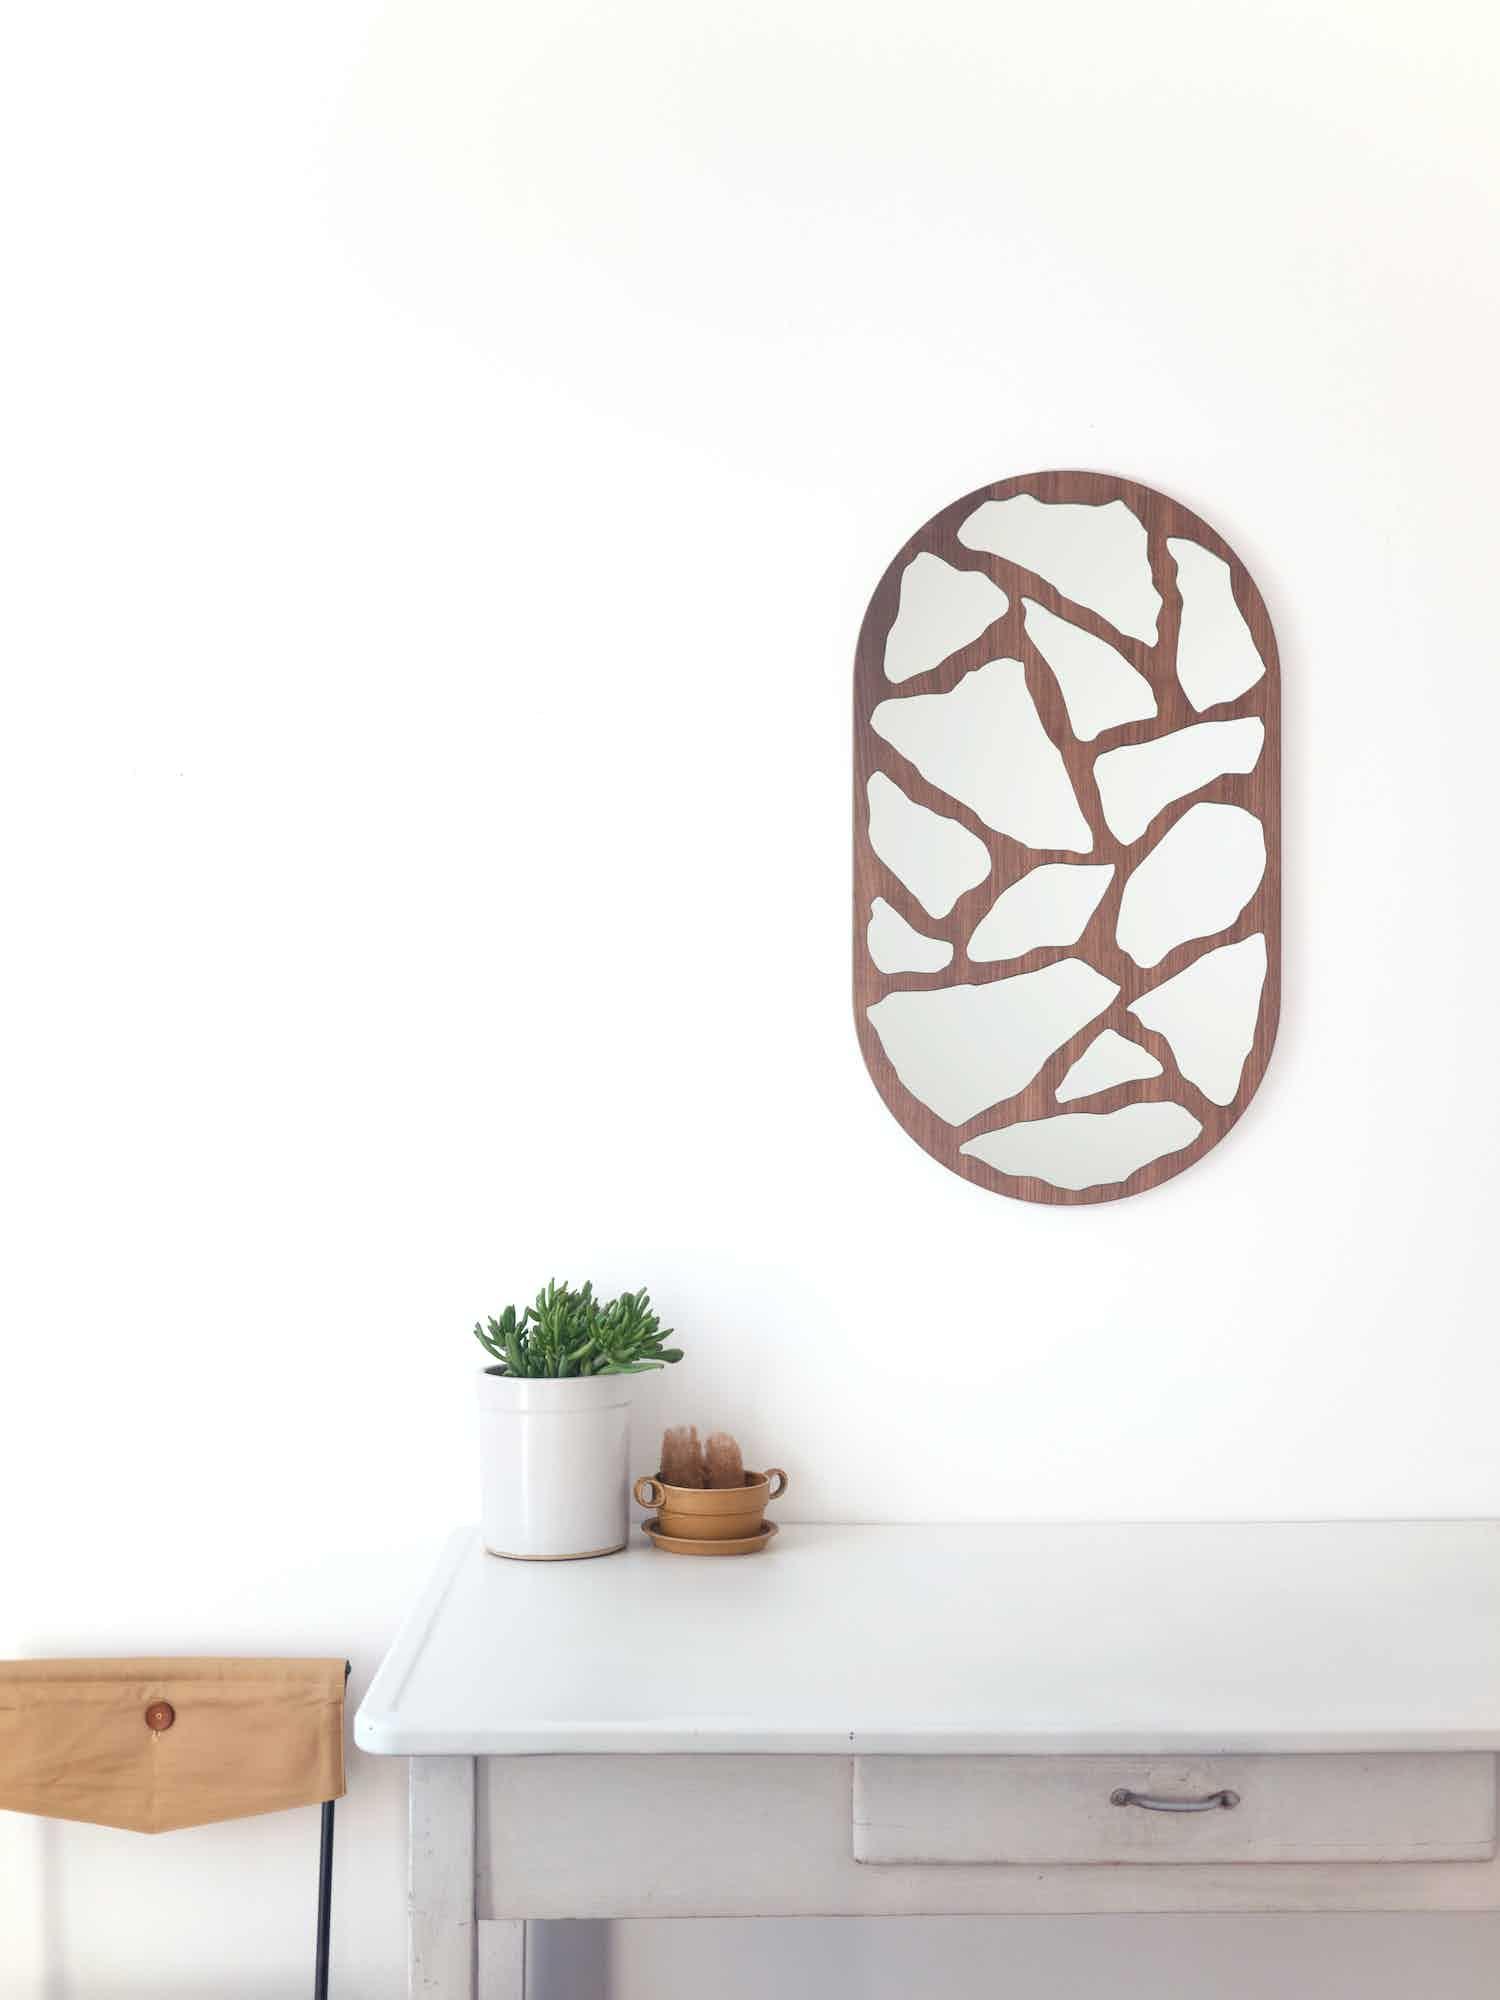 Walnut #3000 Mirror by Trueing | Haute Living